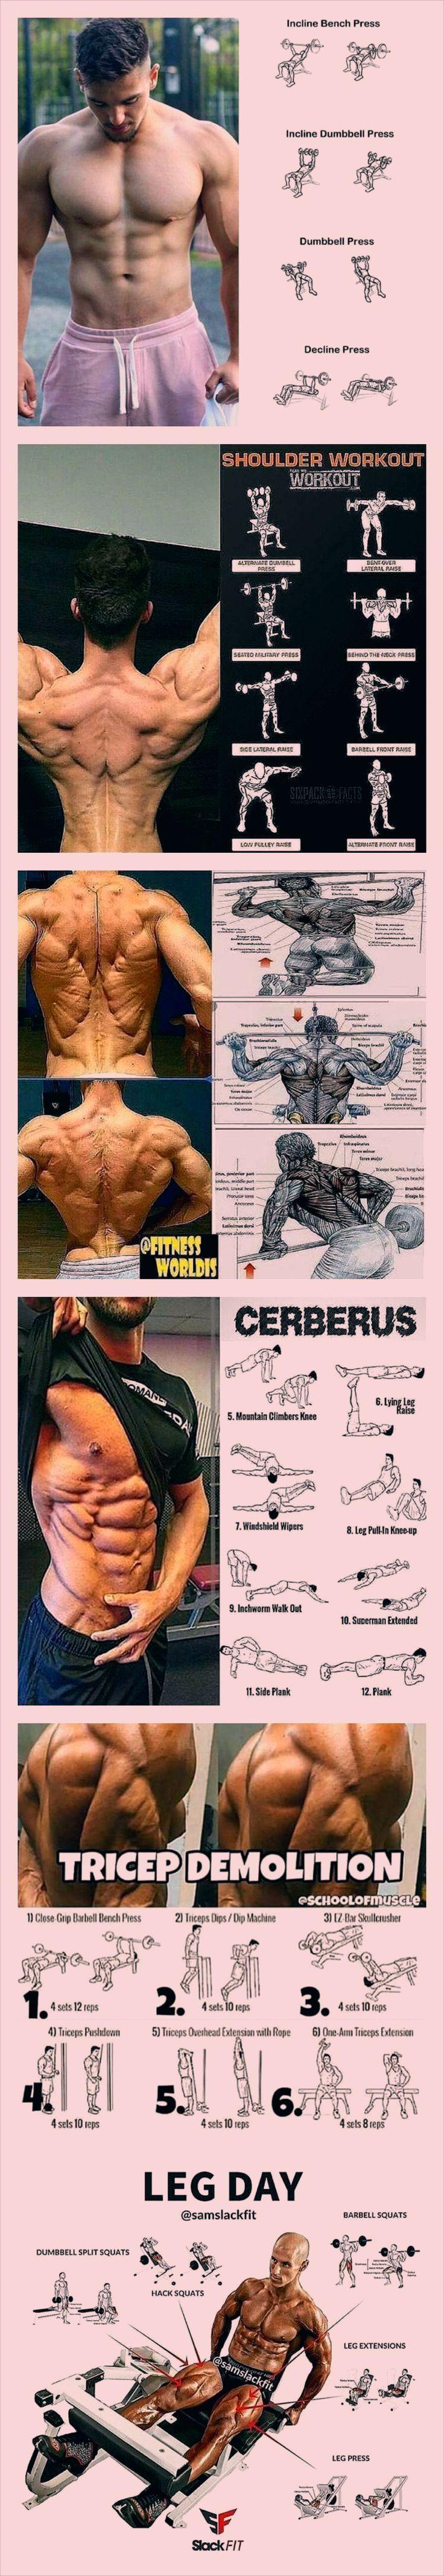 #Fitness #Training #Athlete #Diet #Exercise #Quote #Athlete #diet #exercise #Fitness #Quote #Trainin...